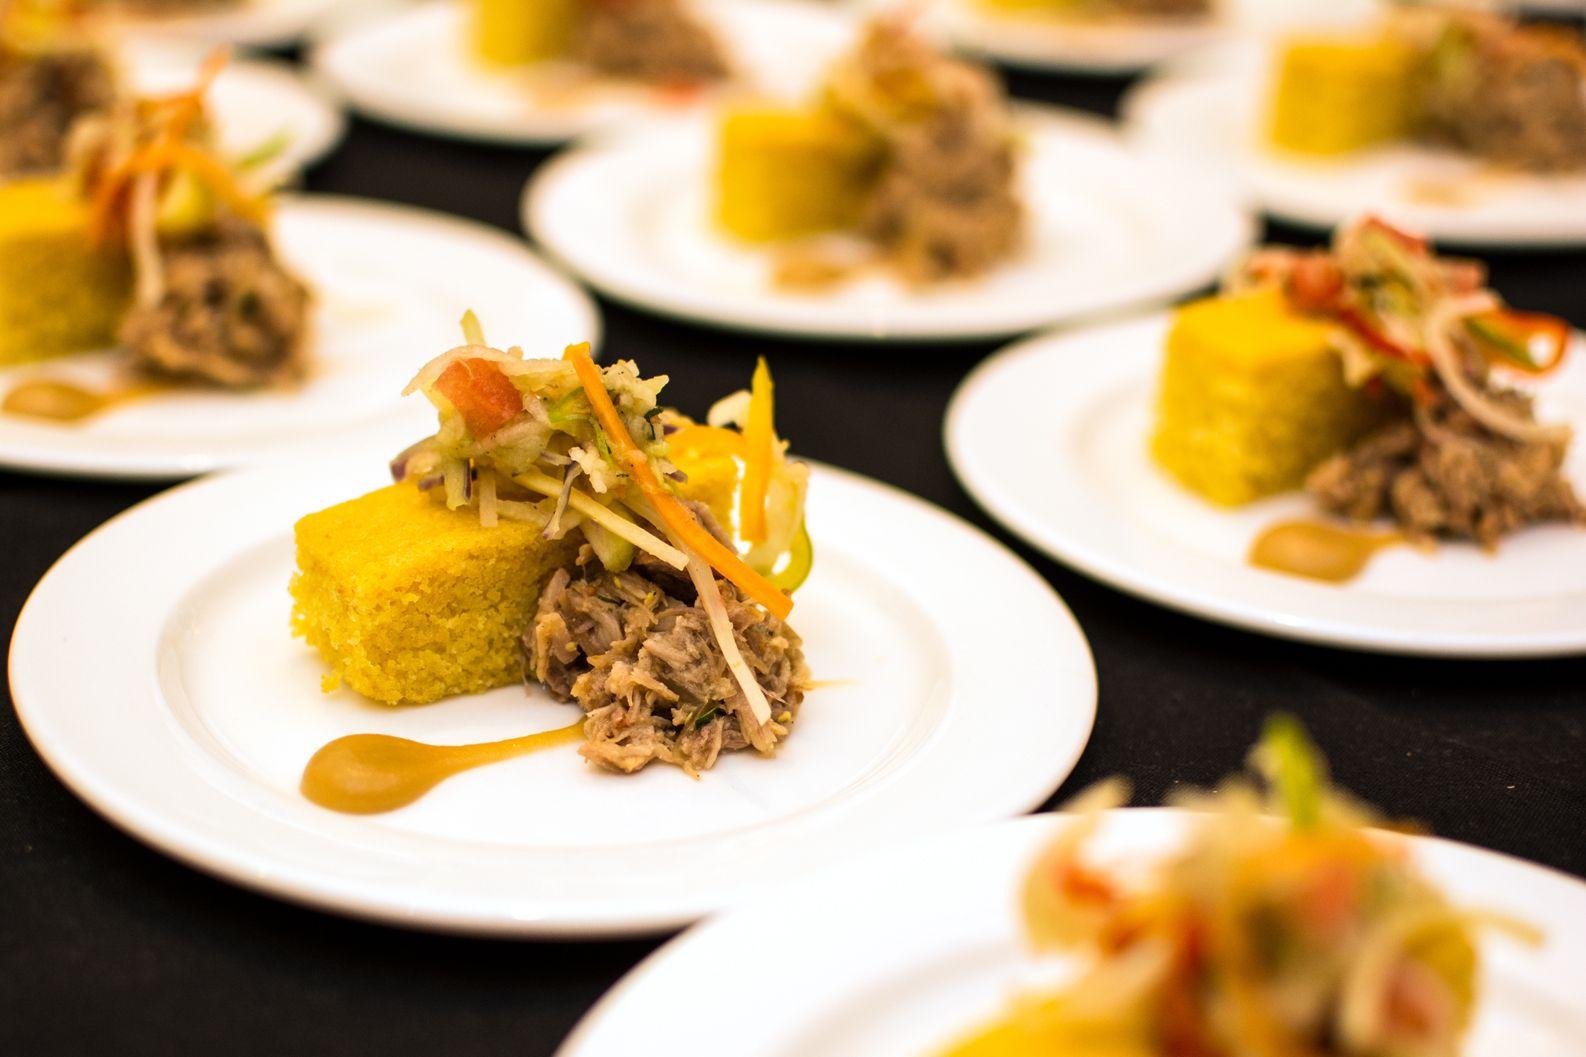 Banquet Food #EpiphanyFarmsEvents #EpiphanyFarms #SpecialEventFood #Catering #BanquetFood